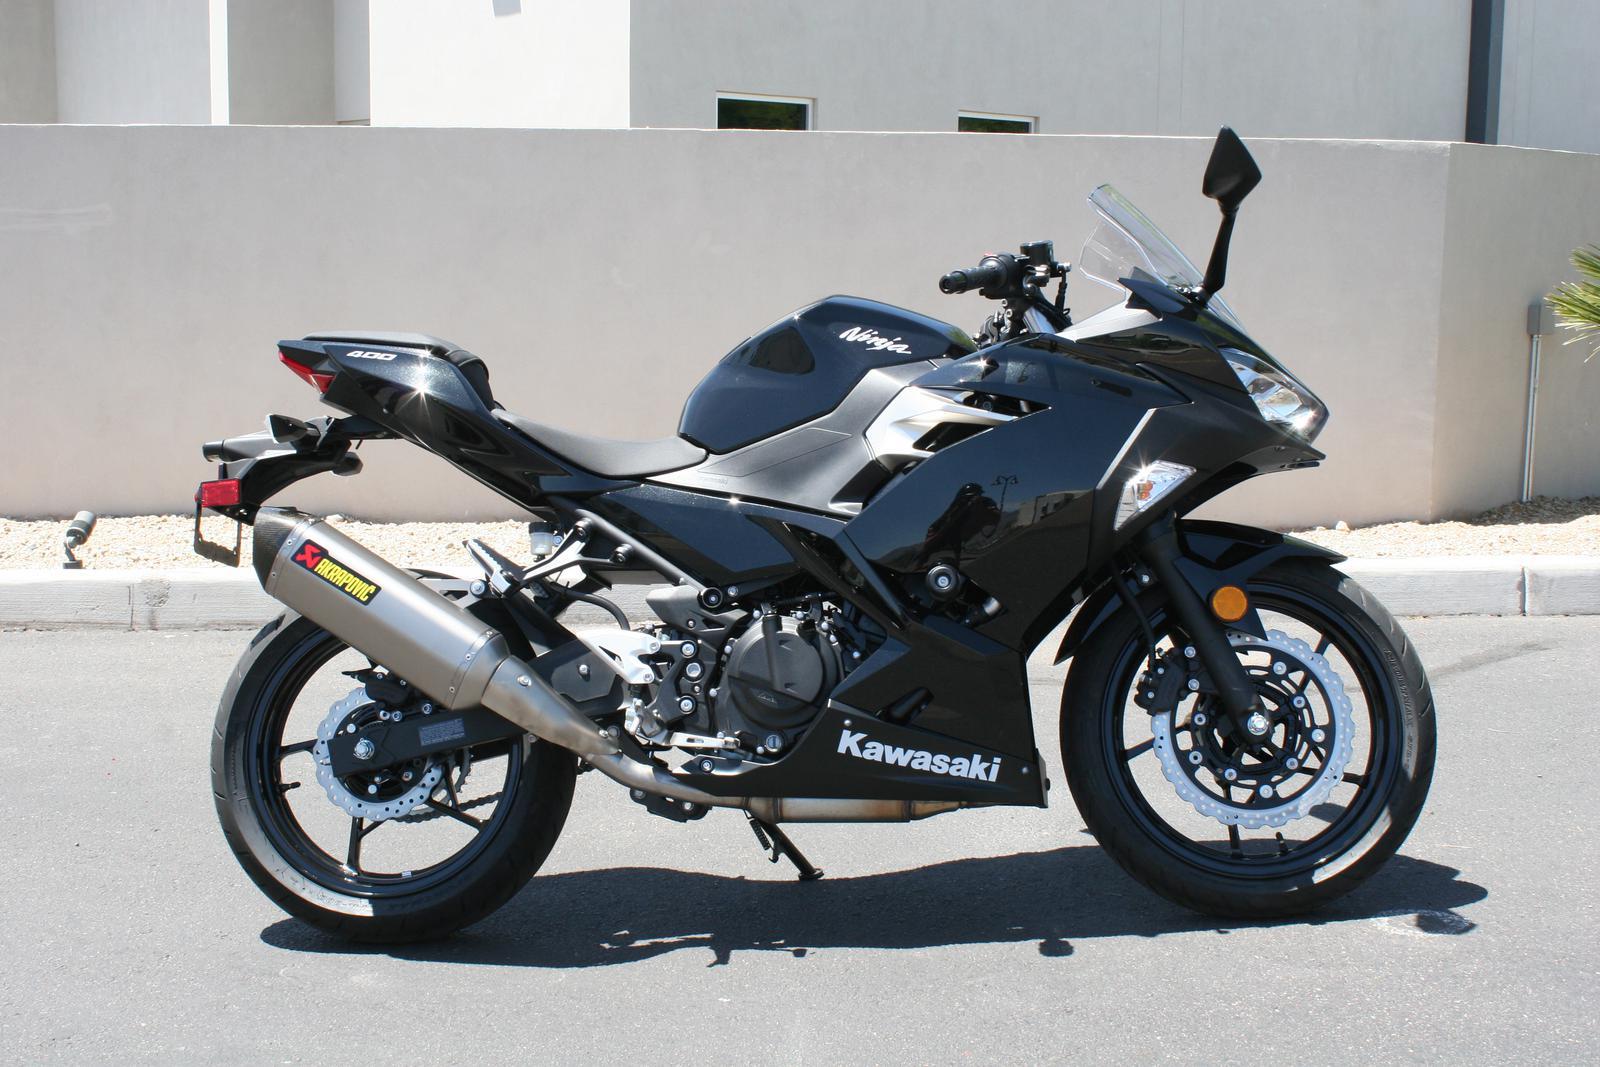 2019 Kawasaki NINJA 400 for sale in Scottsdale, AZ | GO AZ